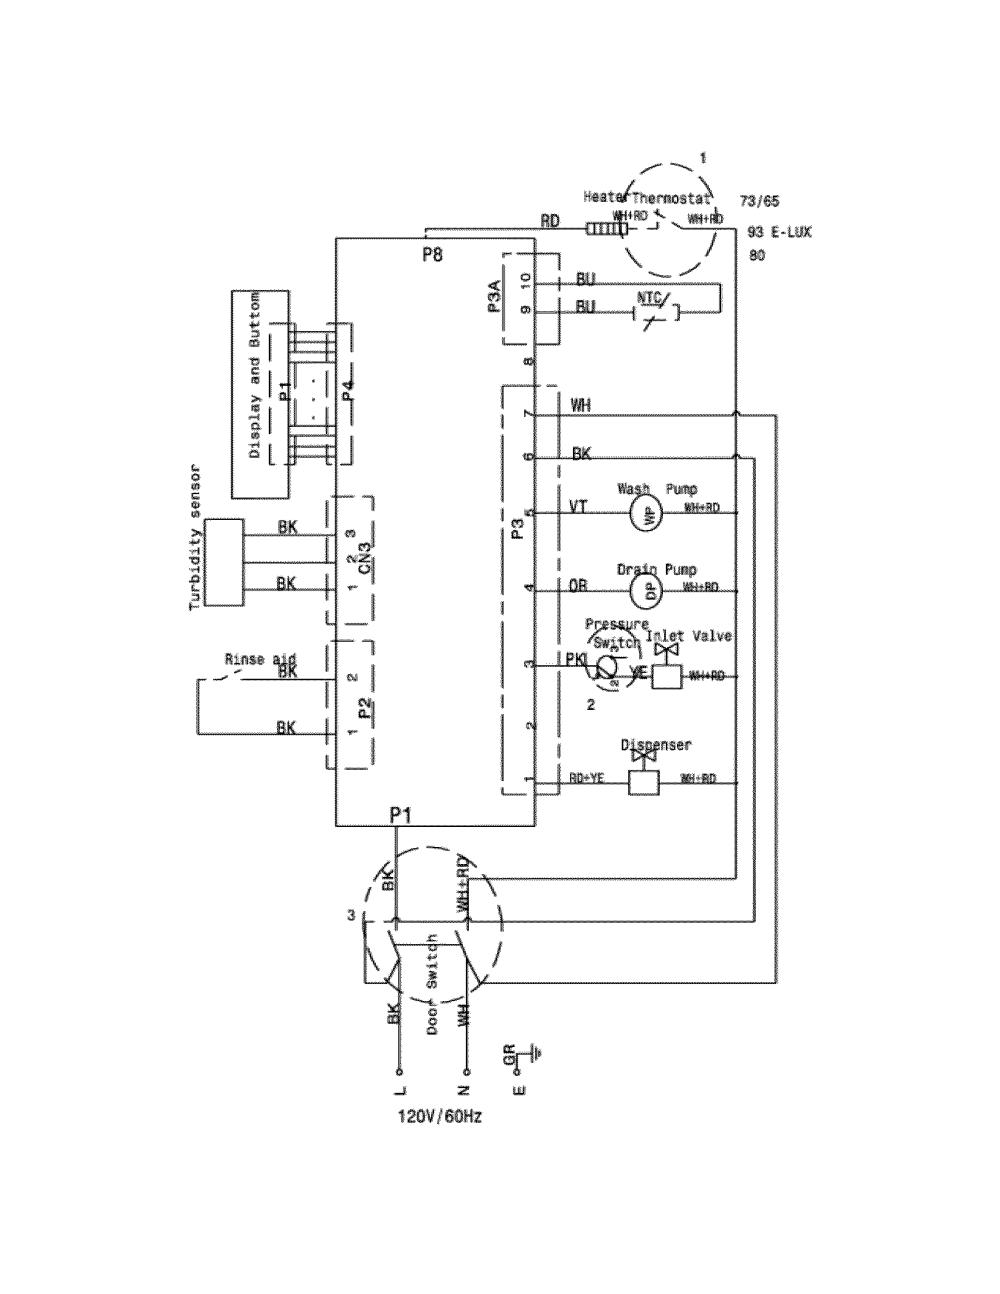 medium resolution of dishwasher pump motor wiring diagram dishwasher get free kitchenaid dishwasher electrical schematic kitchenaid dishwasher wiring diagram kd21ad